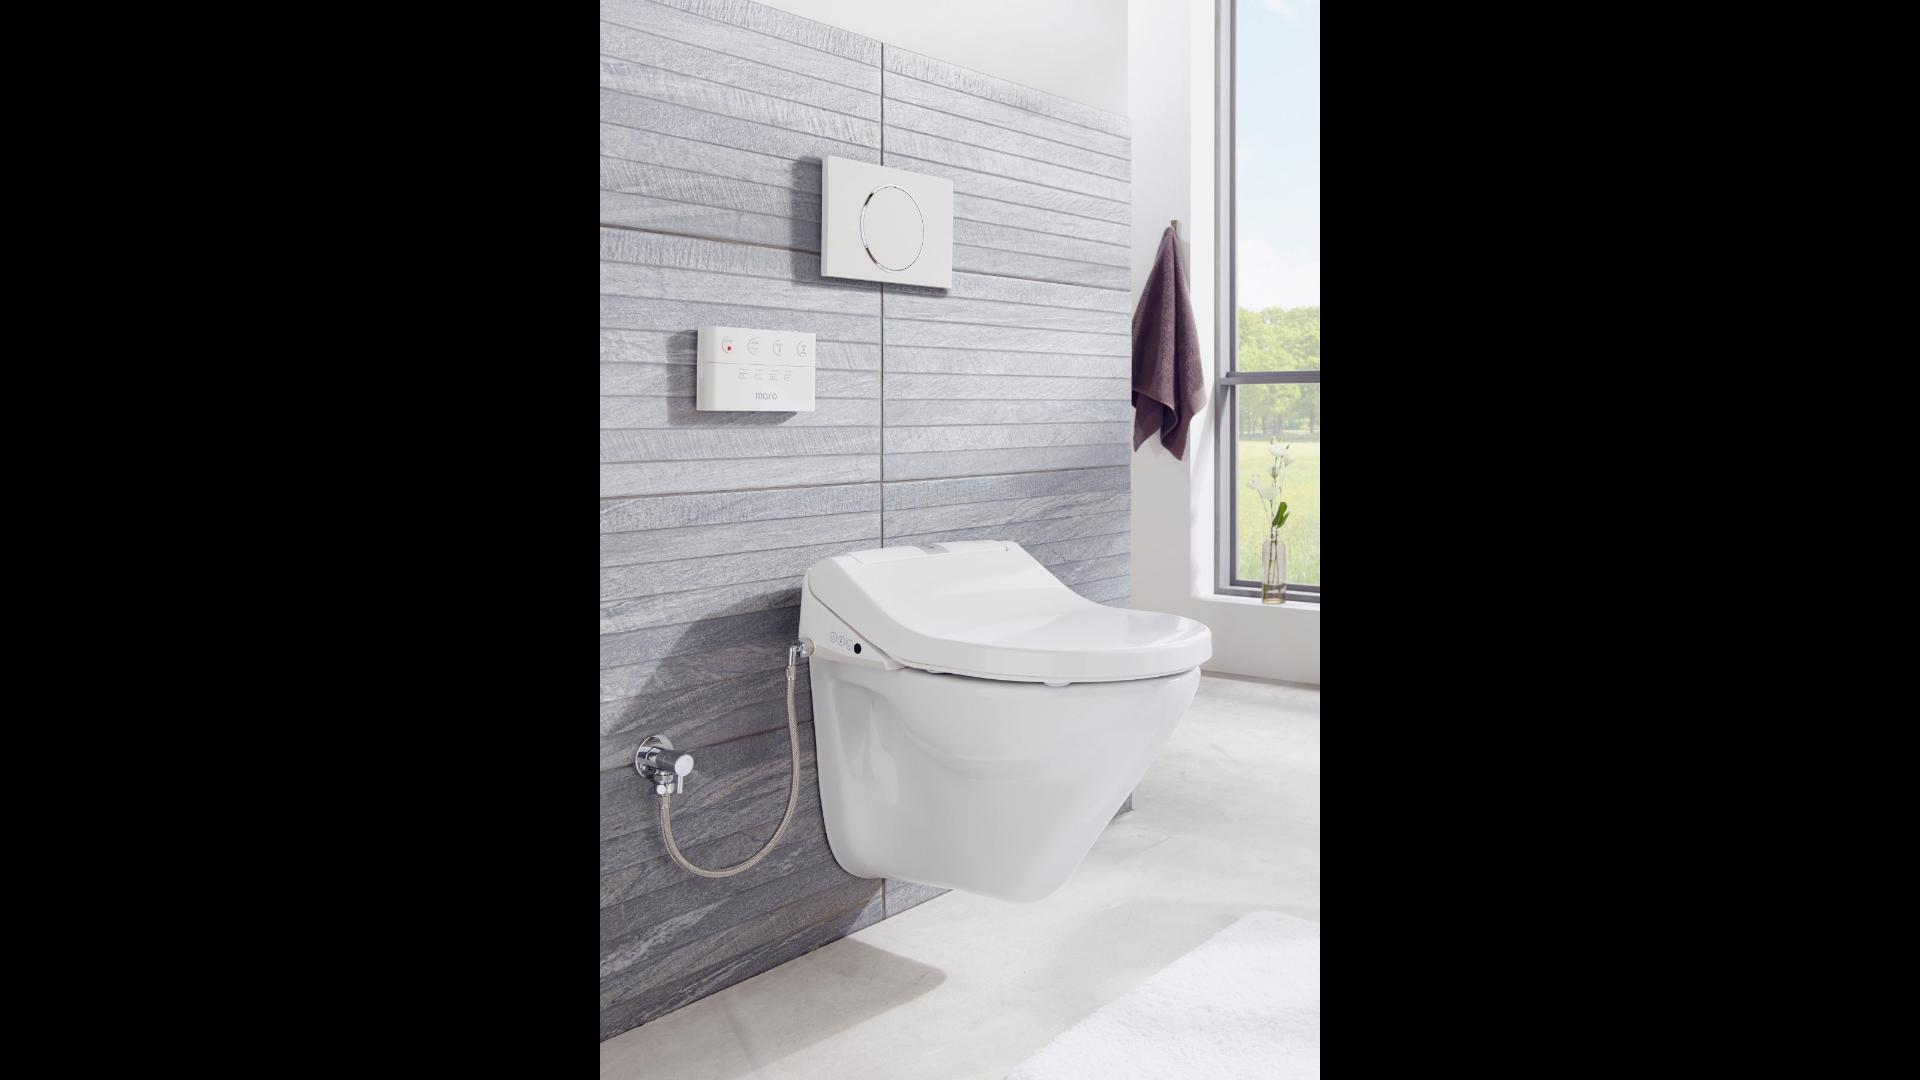 Maro D'Italia Di600 dusch wc aufsatz